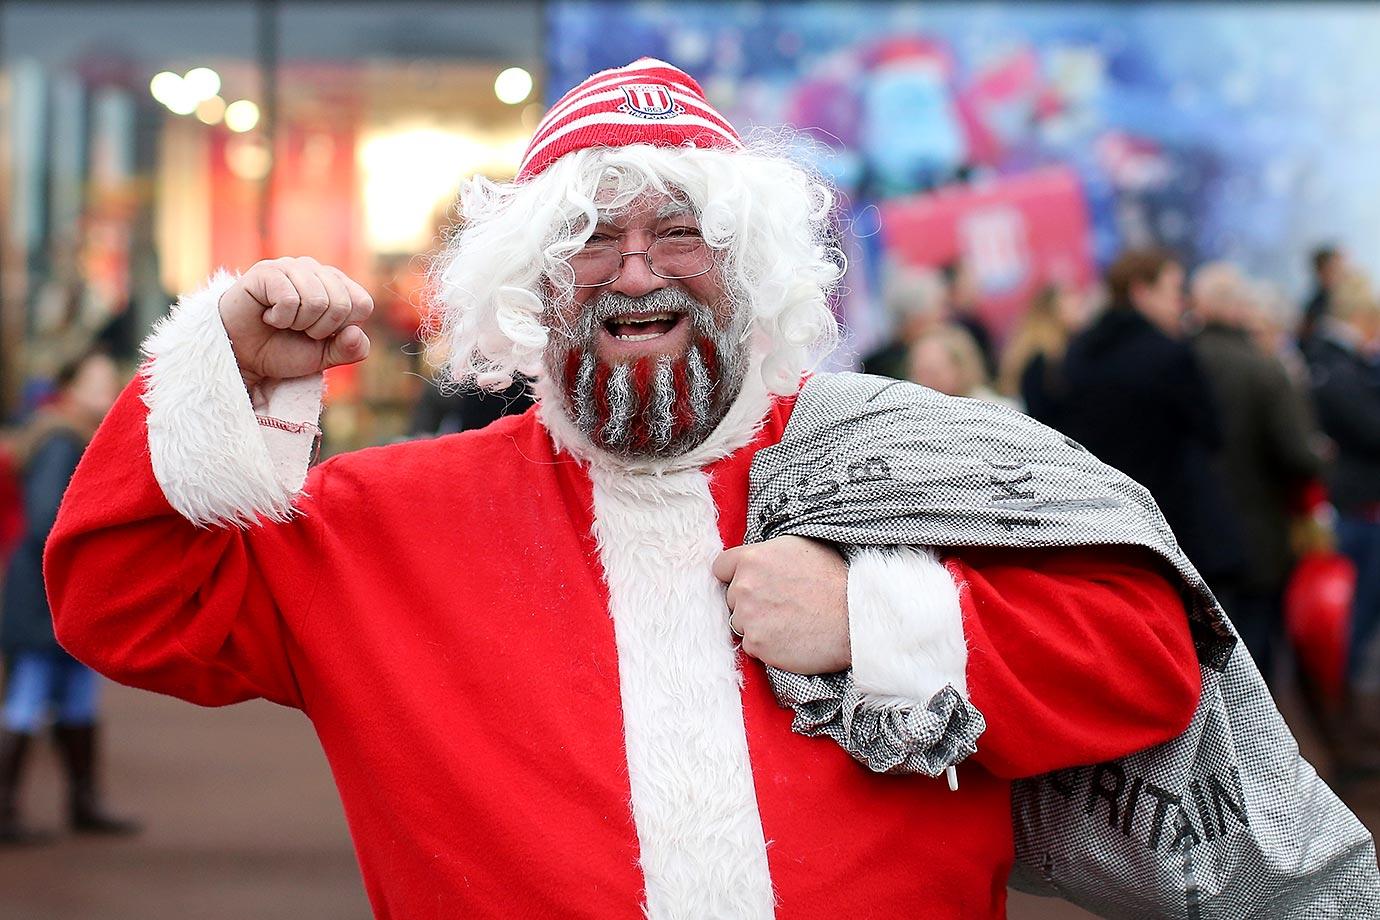 Santa at the Barclays Premier League match between Stoke City and Crystal Palace at Britannia Stadium.